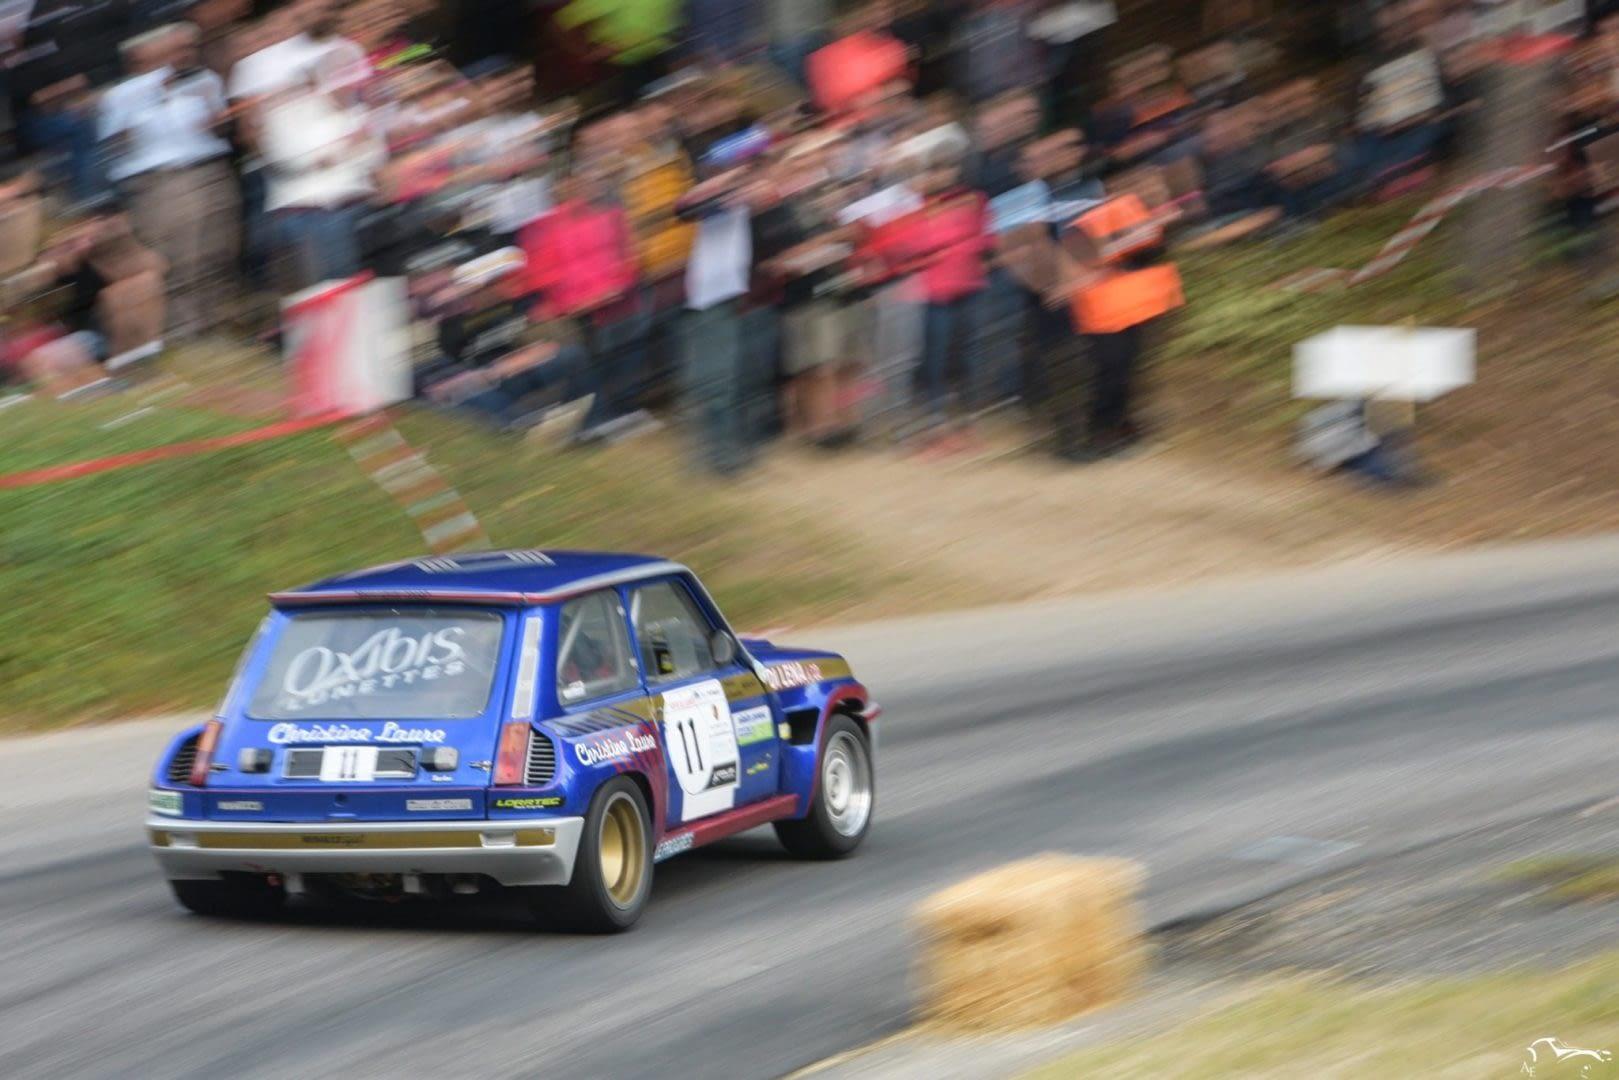 Renault 5 TDC